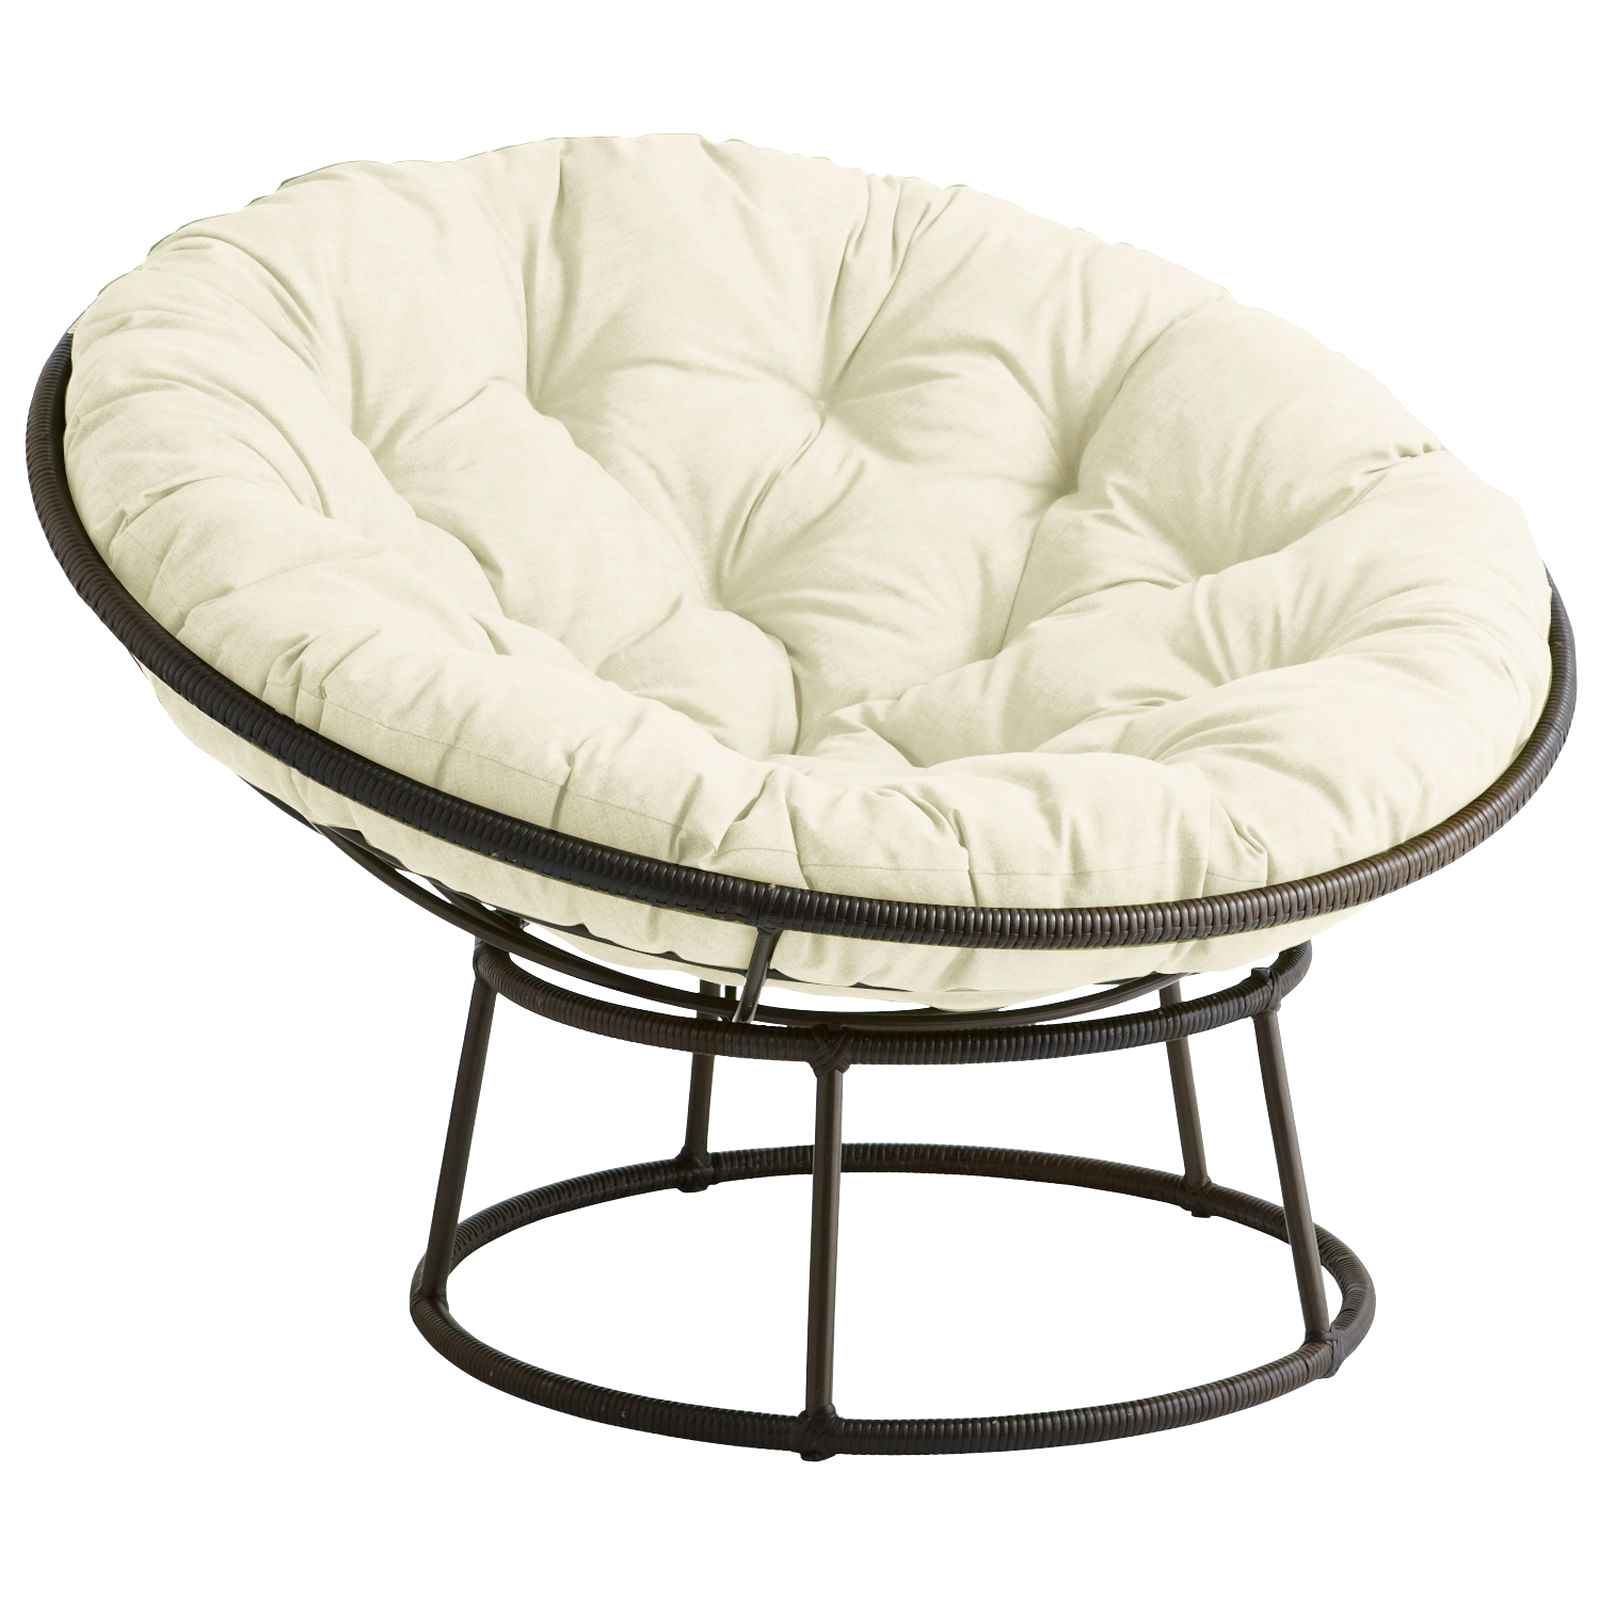 Captivating Double Papasan Chair Double Papasan Cushion Replacement Papasan Cushion  From Double